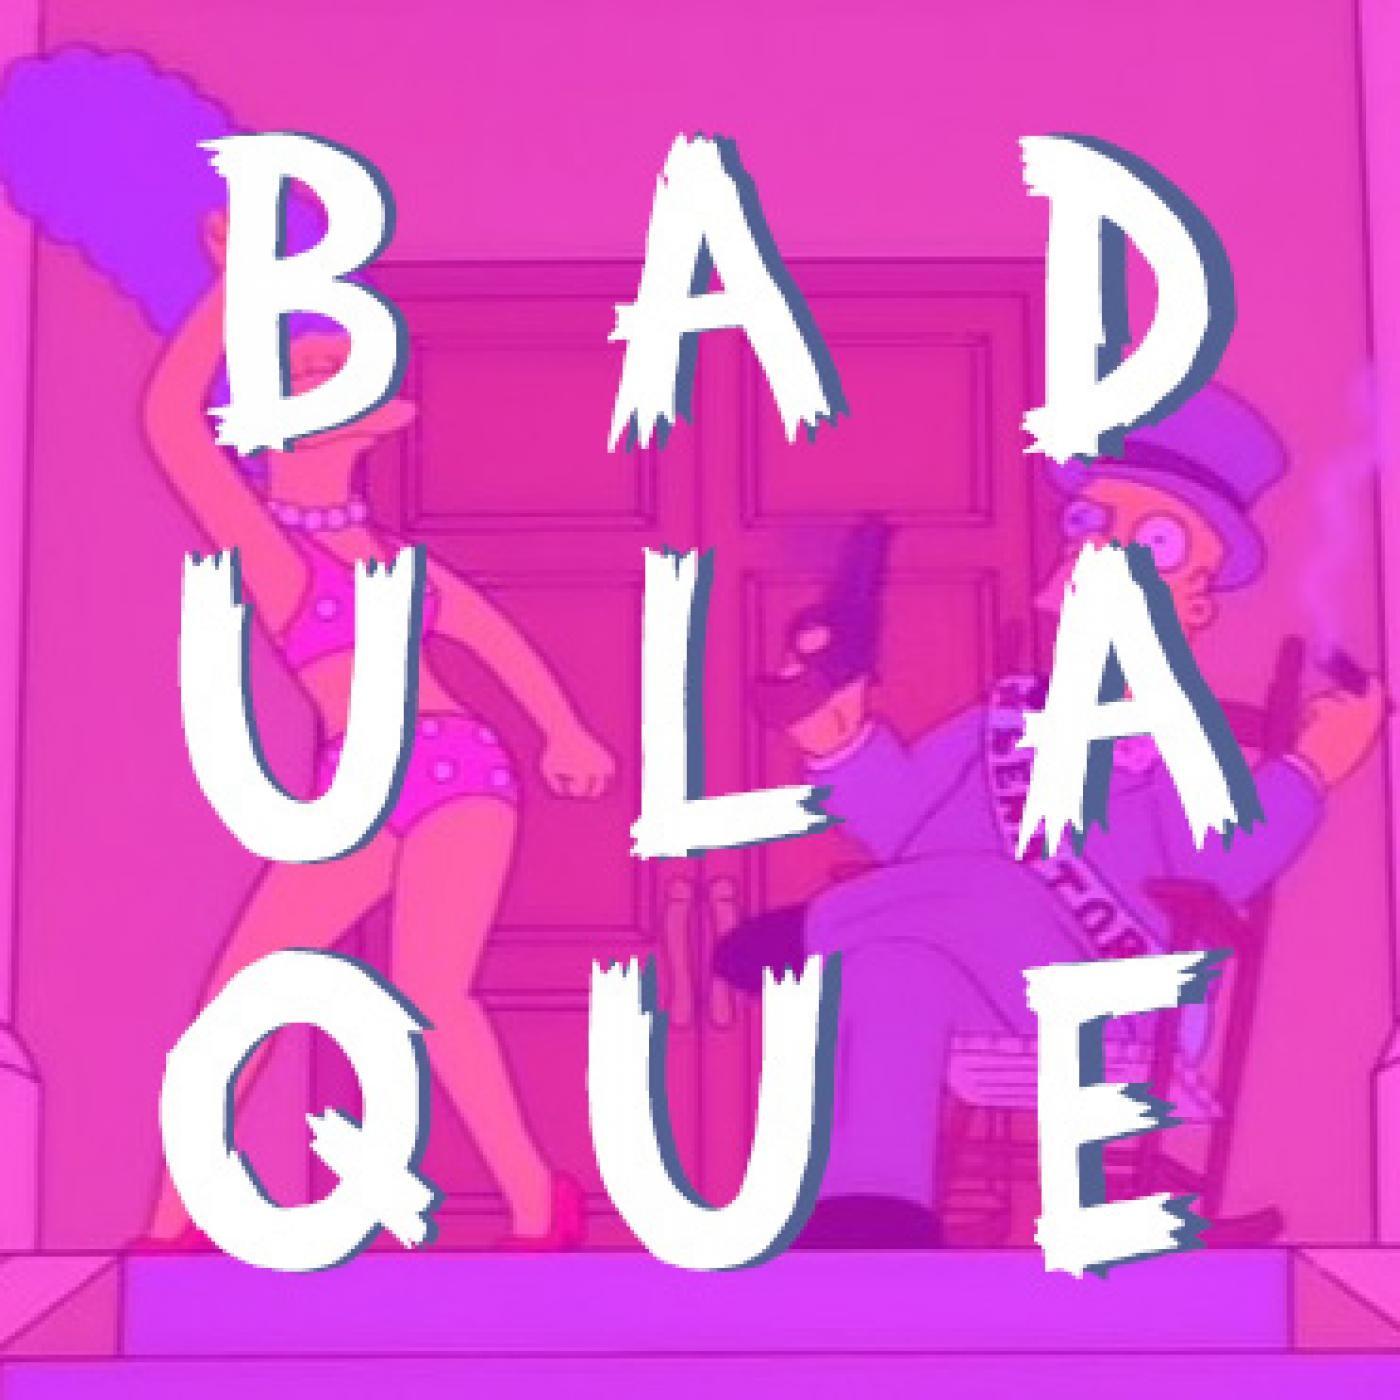 <![CDATA[Badulaque Podcast]]>